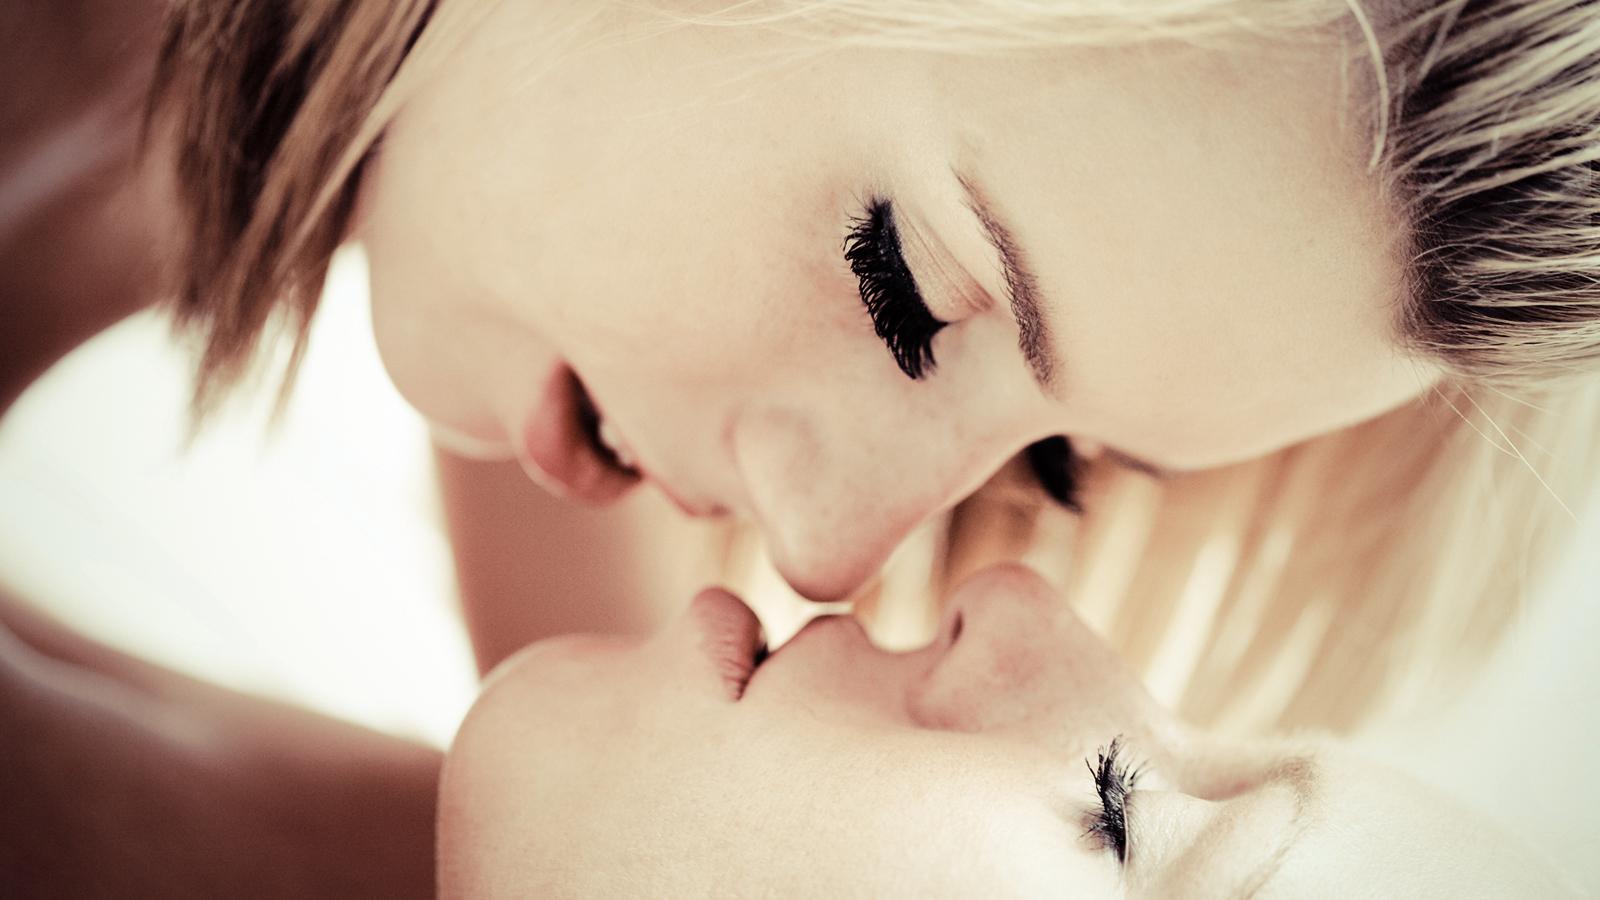 Free photo people, children, girls, boys, couple, kiss, australian, 200807151700